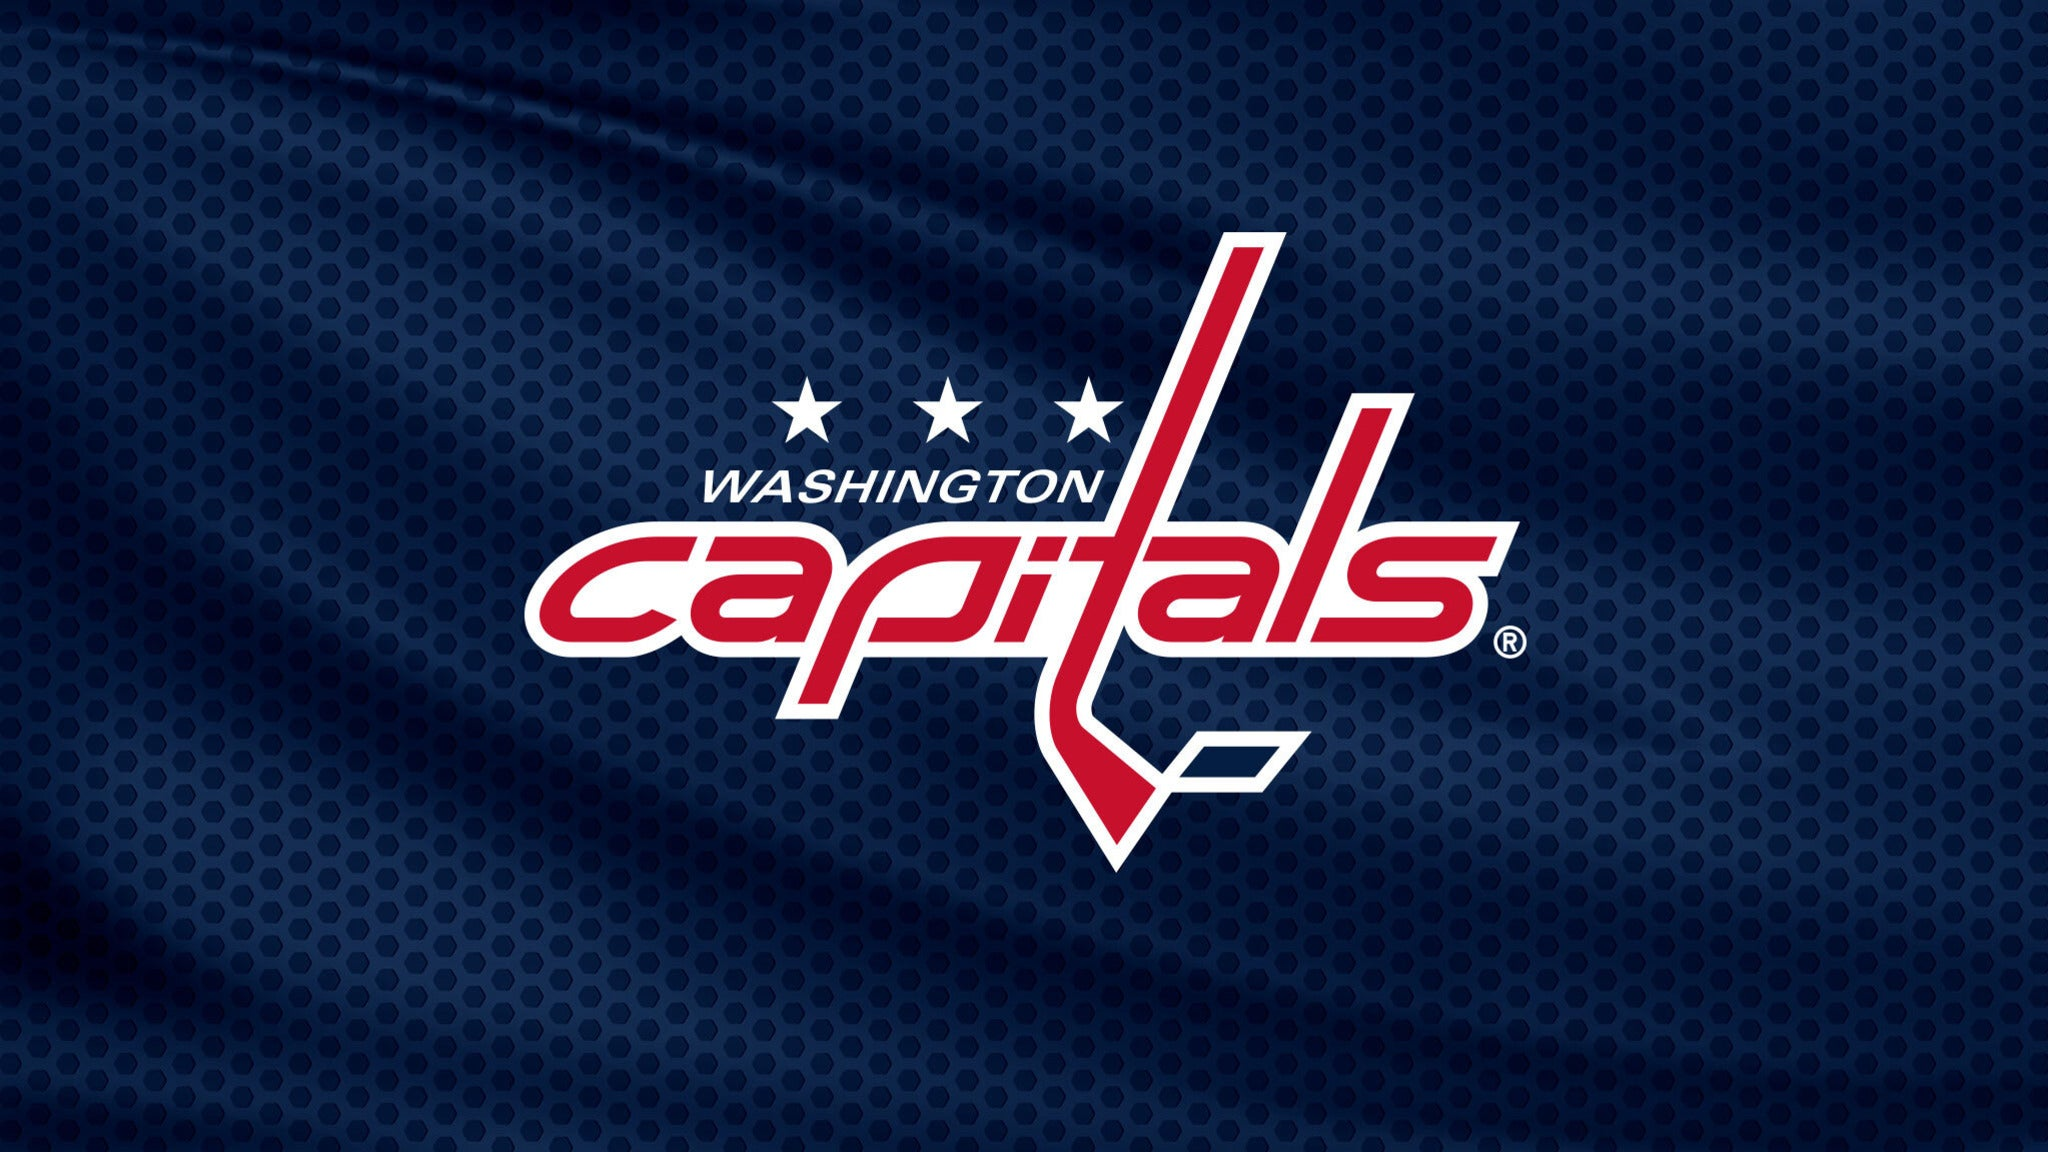 Washington Capitals vs. Winnipeg Jets at Capital One Arena